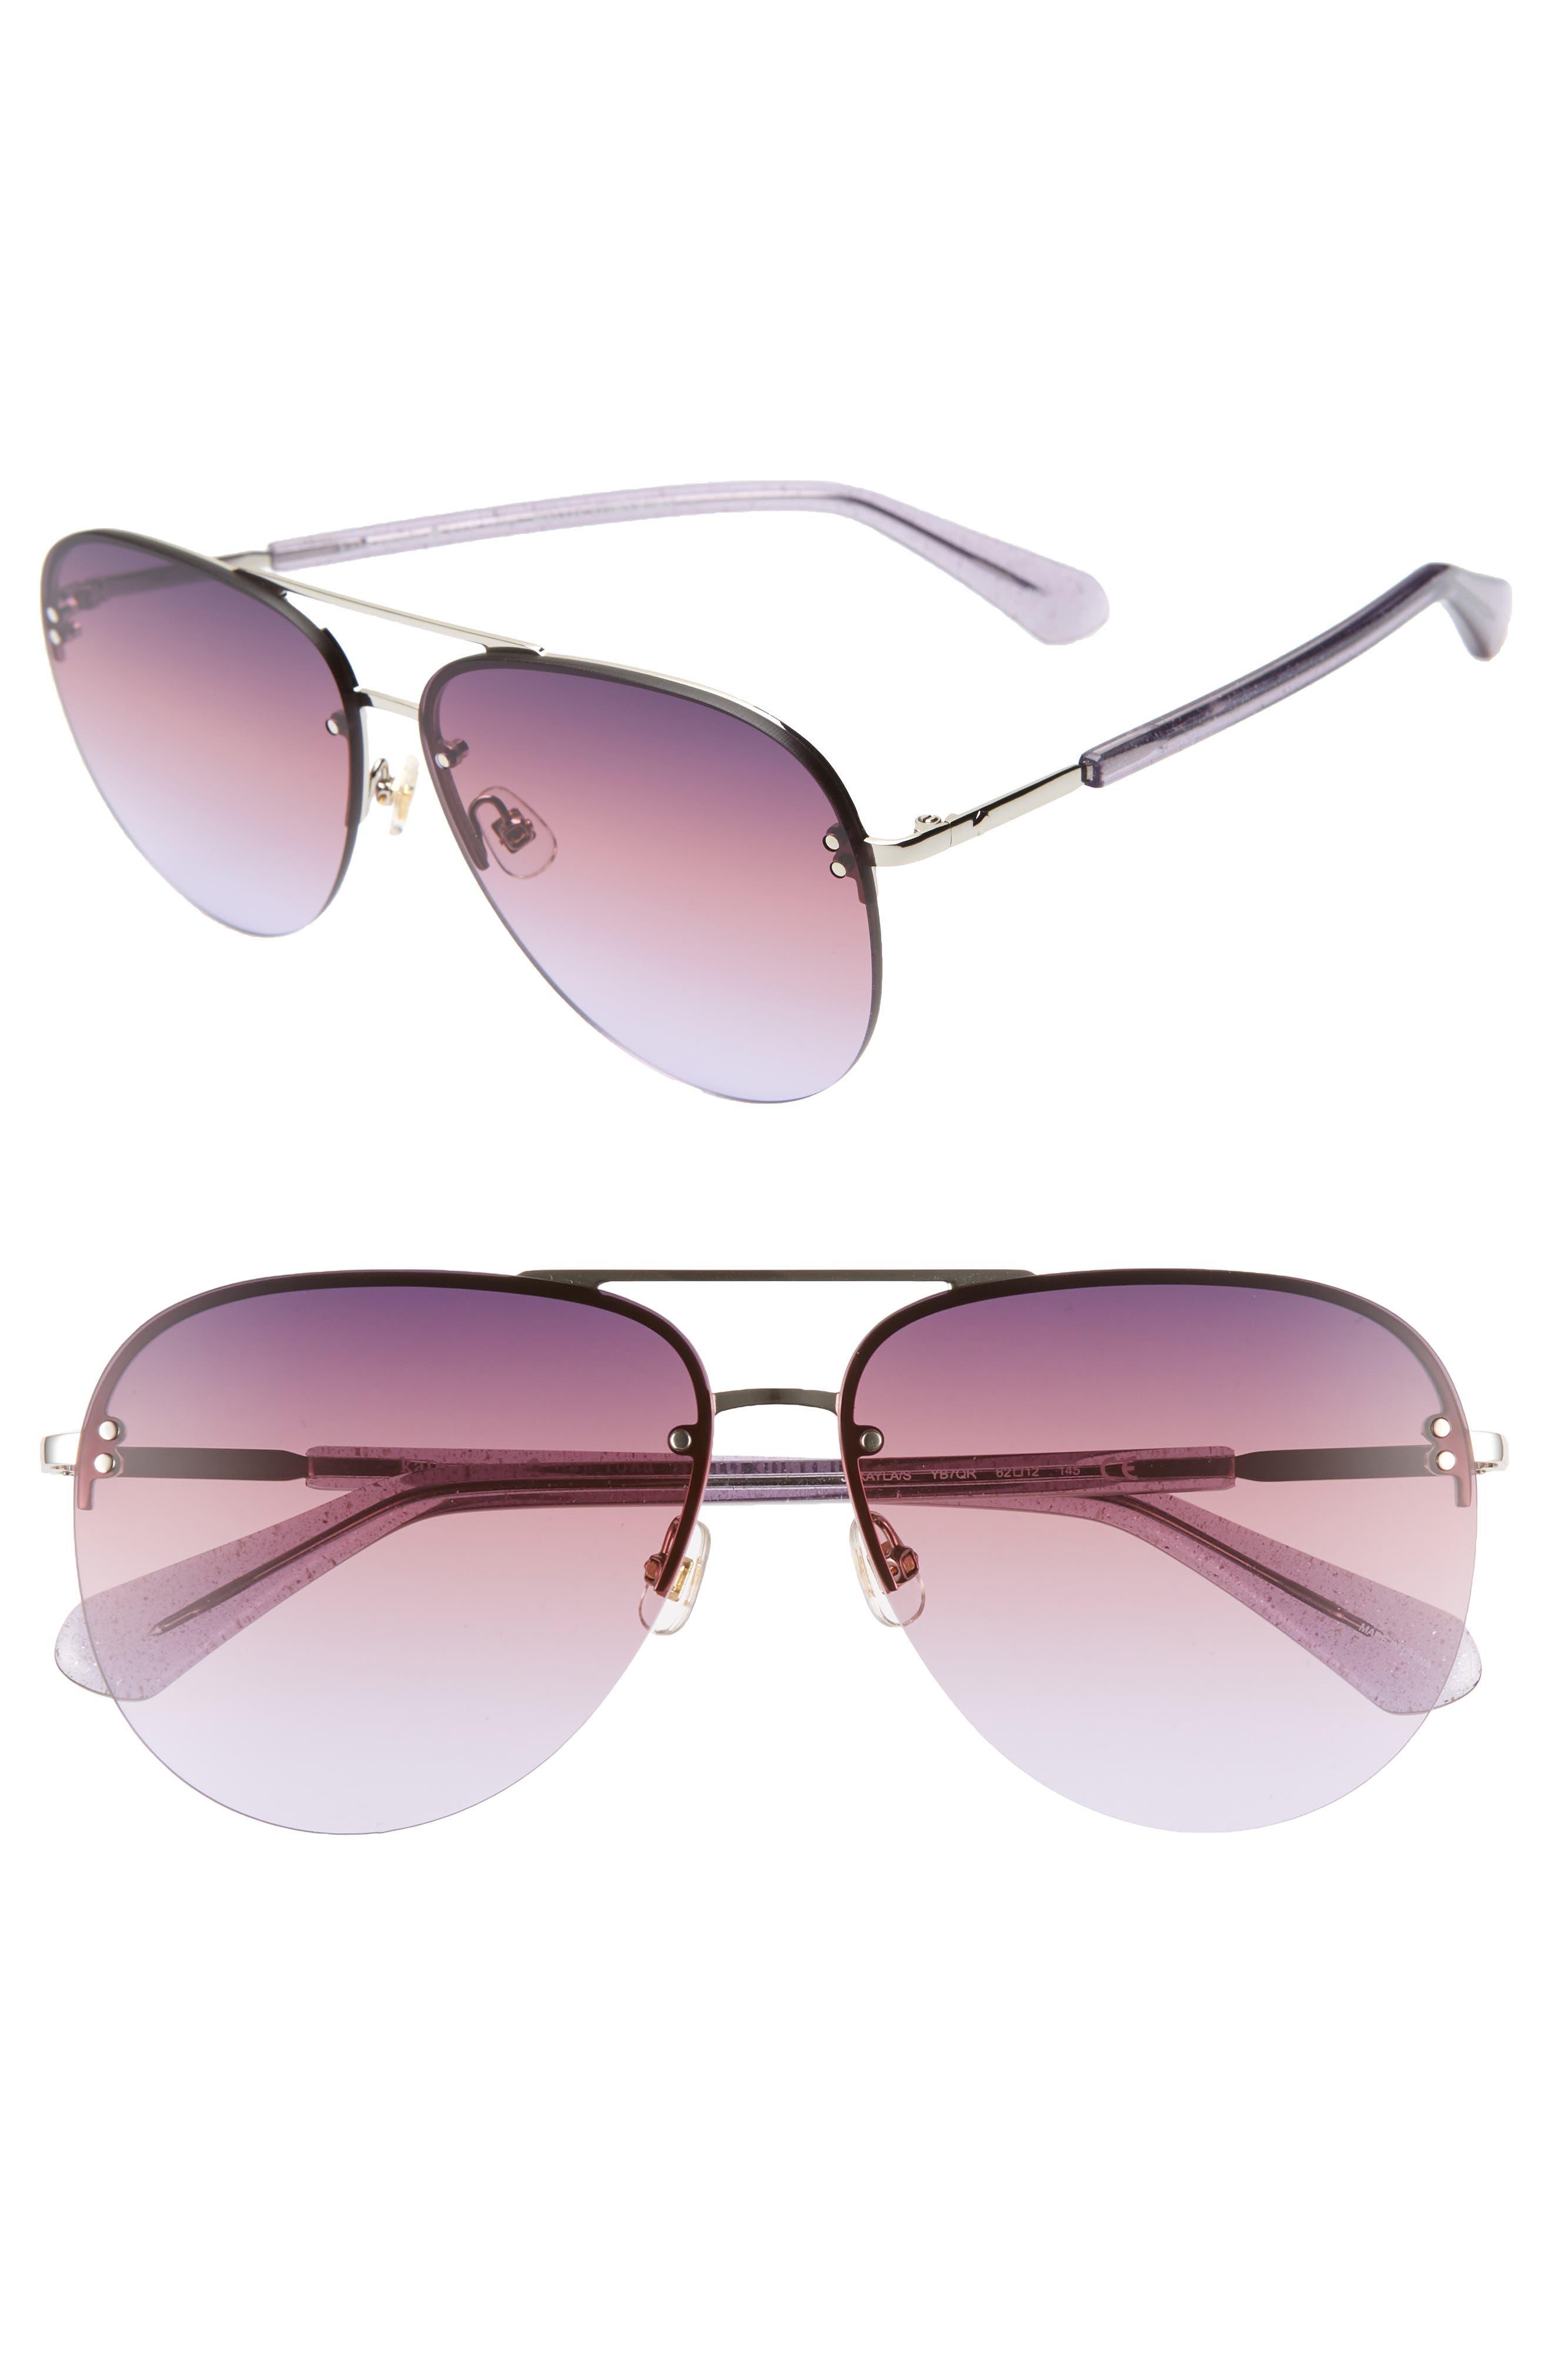 jakaylas 62mm aviator sunglasses,                             Main thumbnail 1, color,                             SILVER